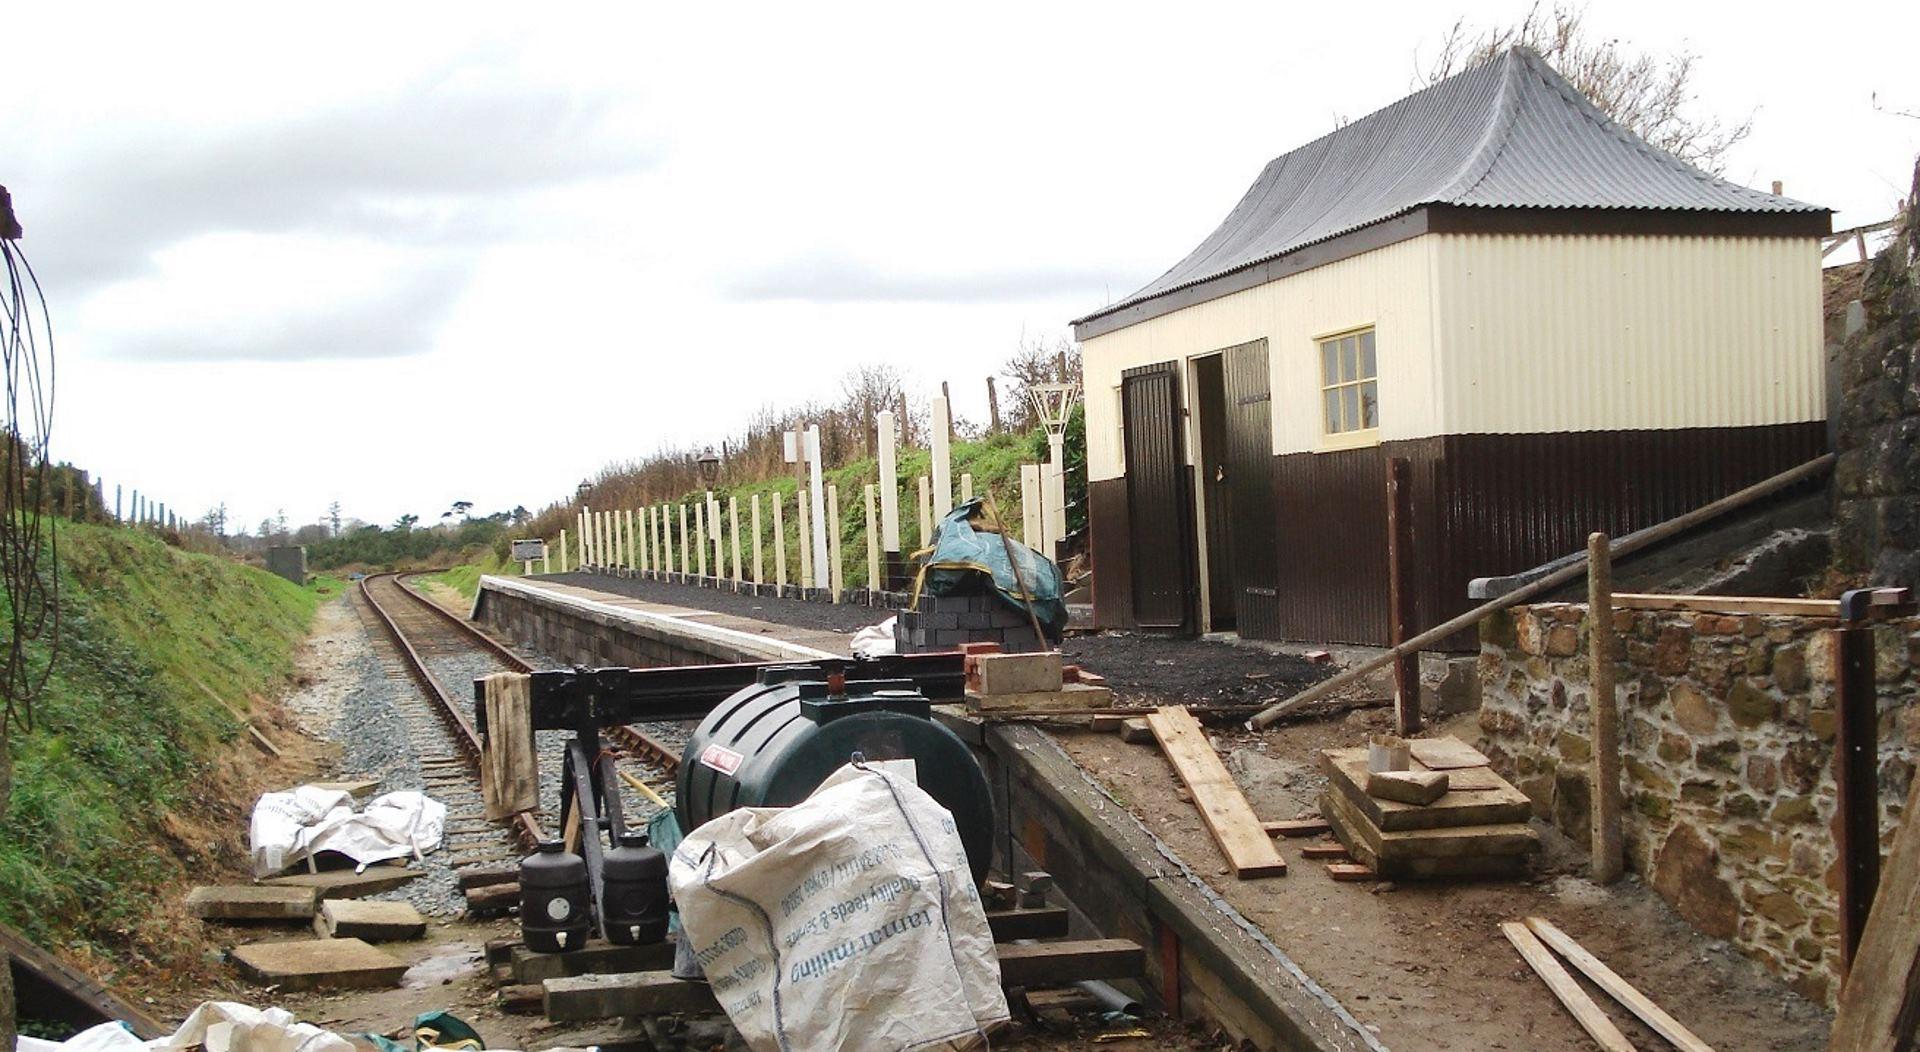 Truthall Halt Station on the Helston Railway